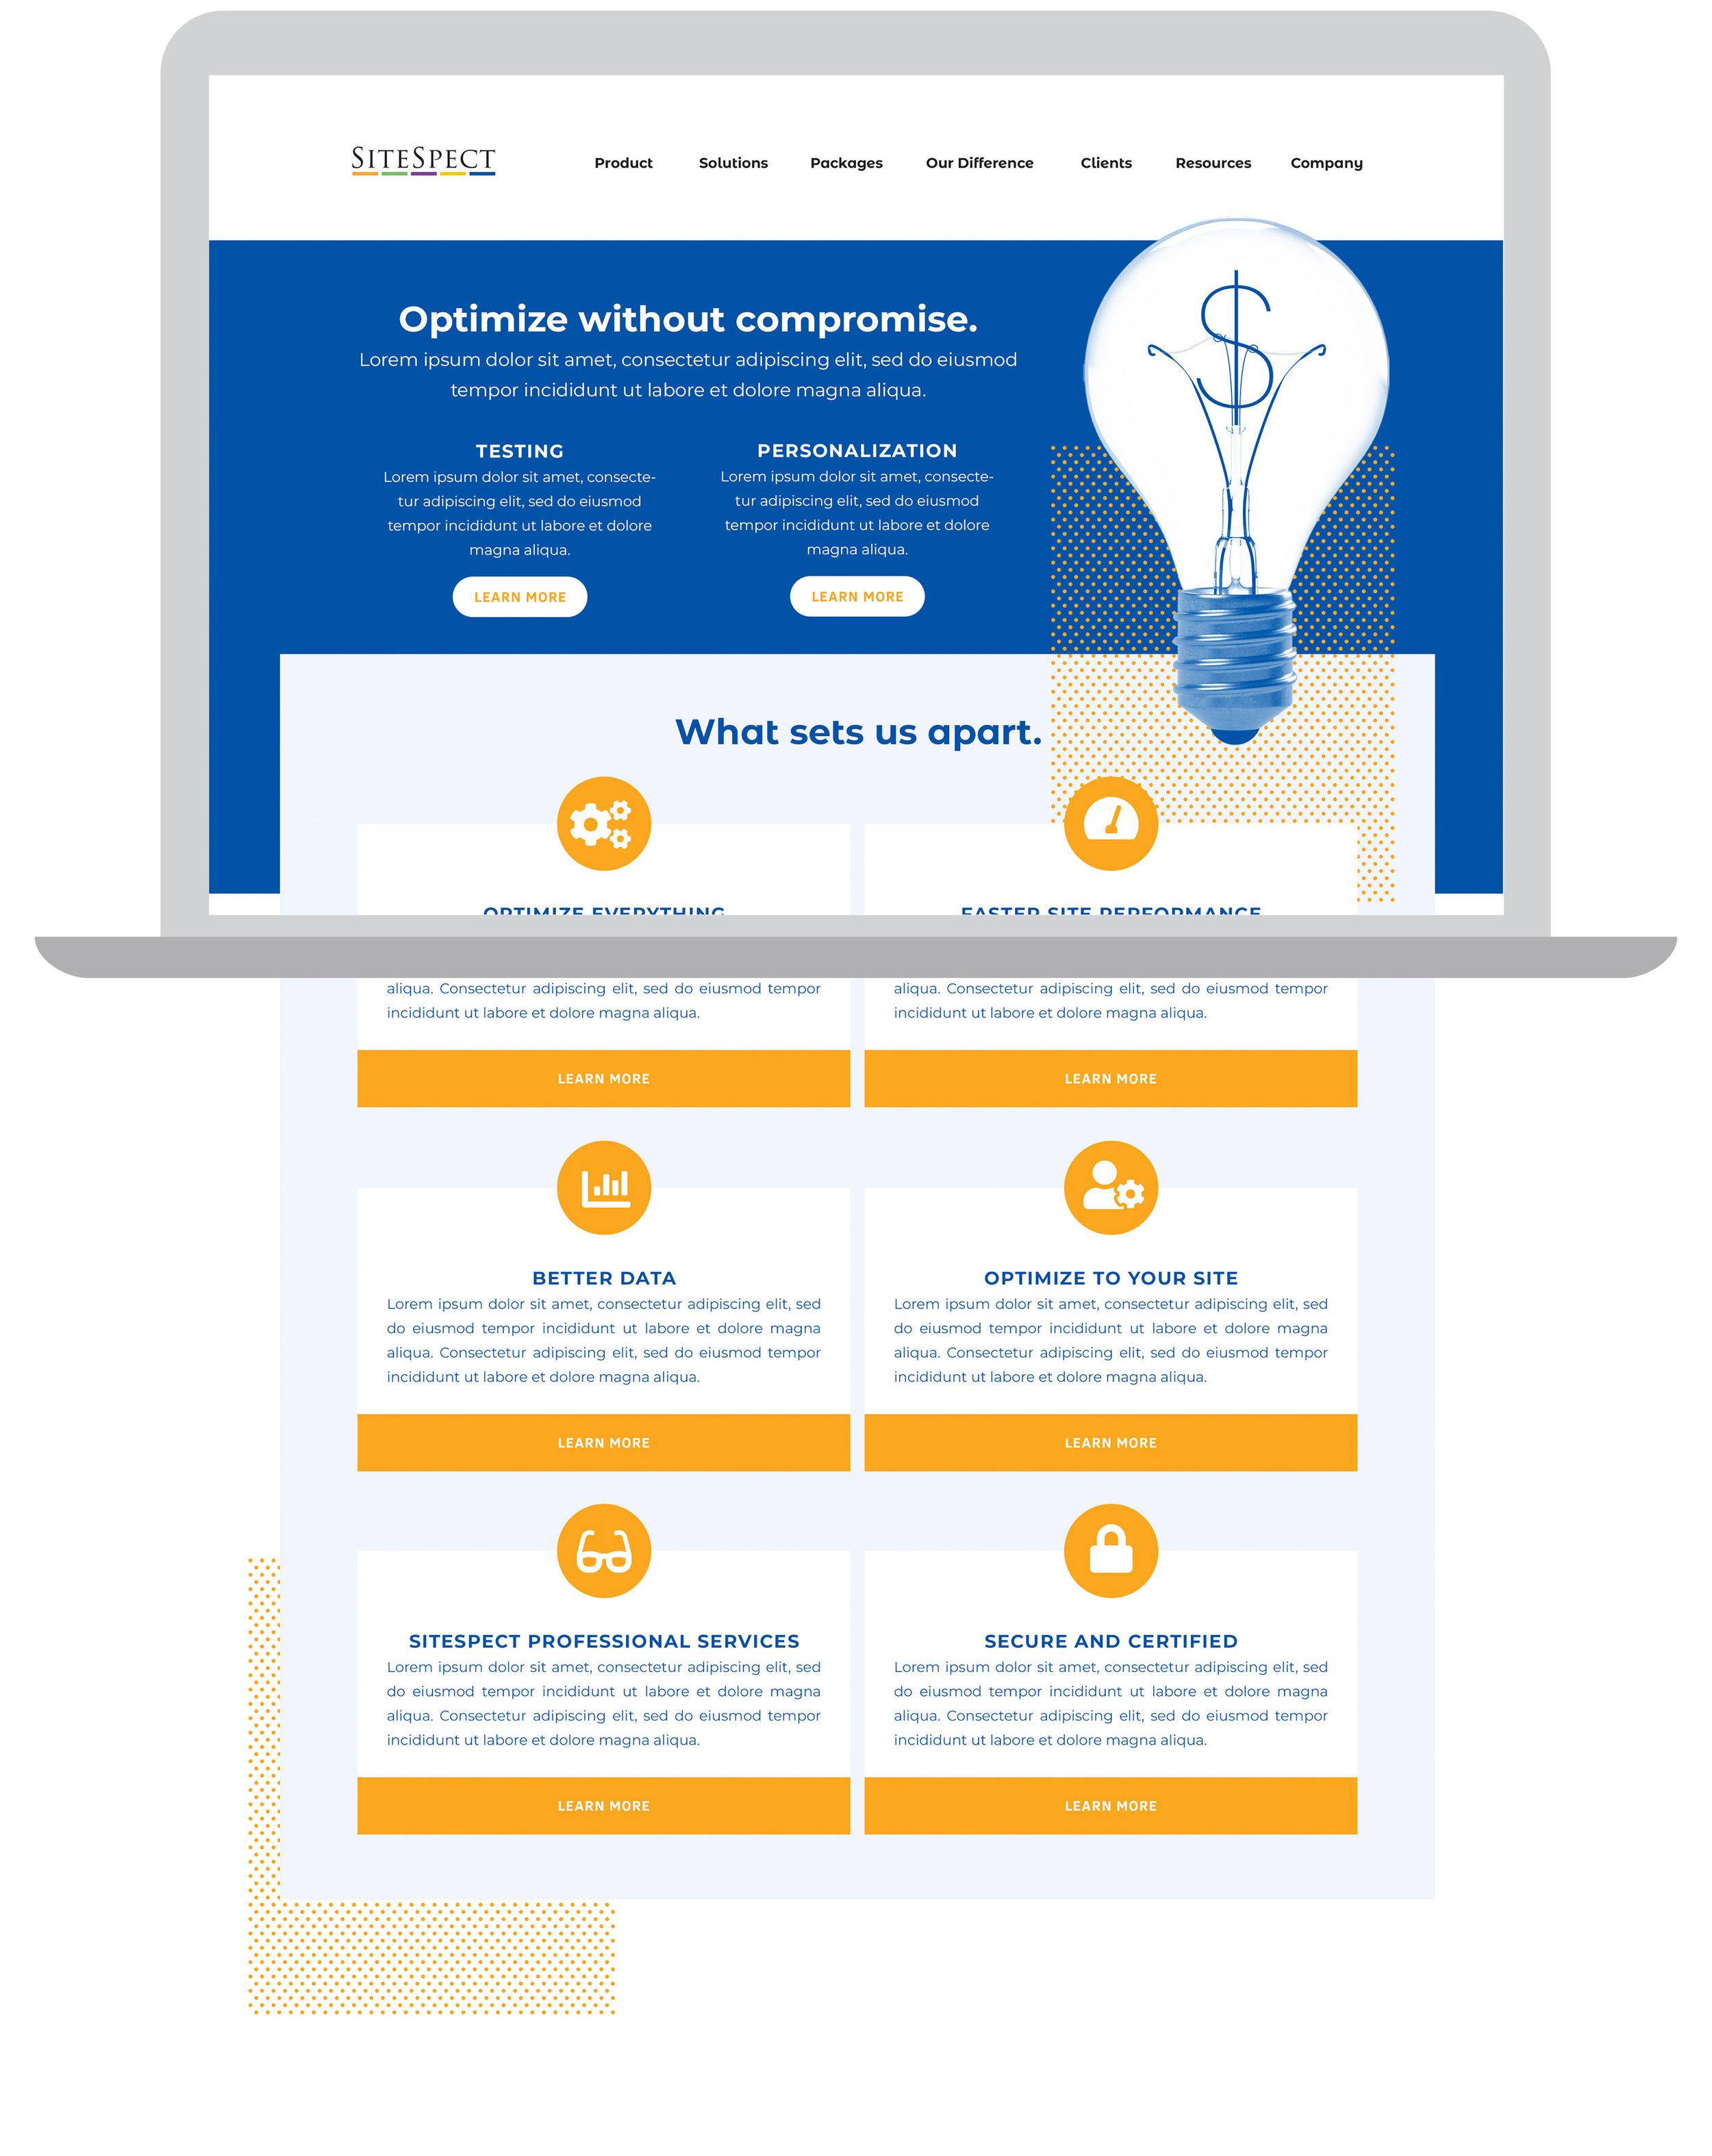 Studio-Eighty-Seven-SiteSpect-Marketing-Support-Website-Design.jpg